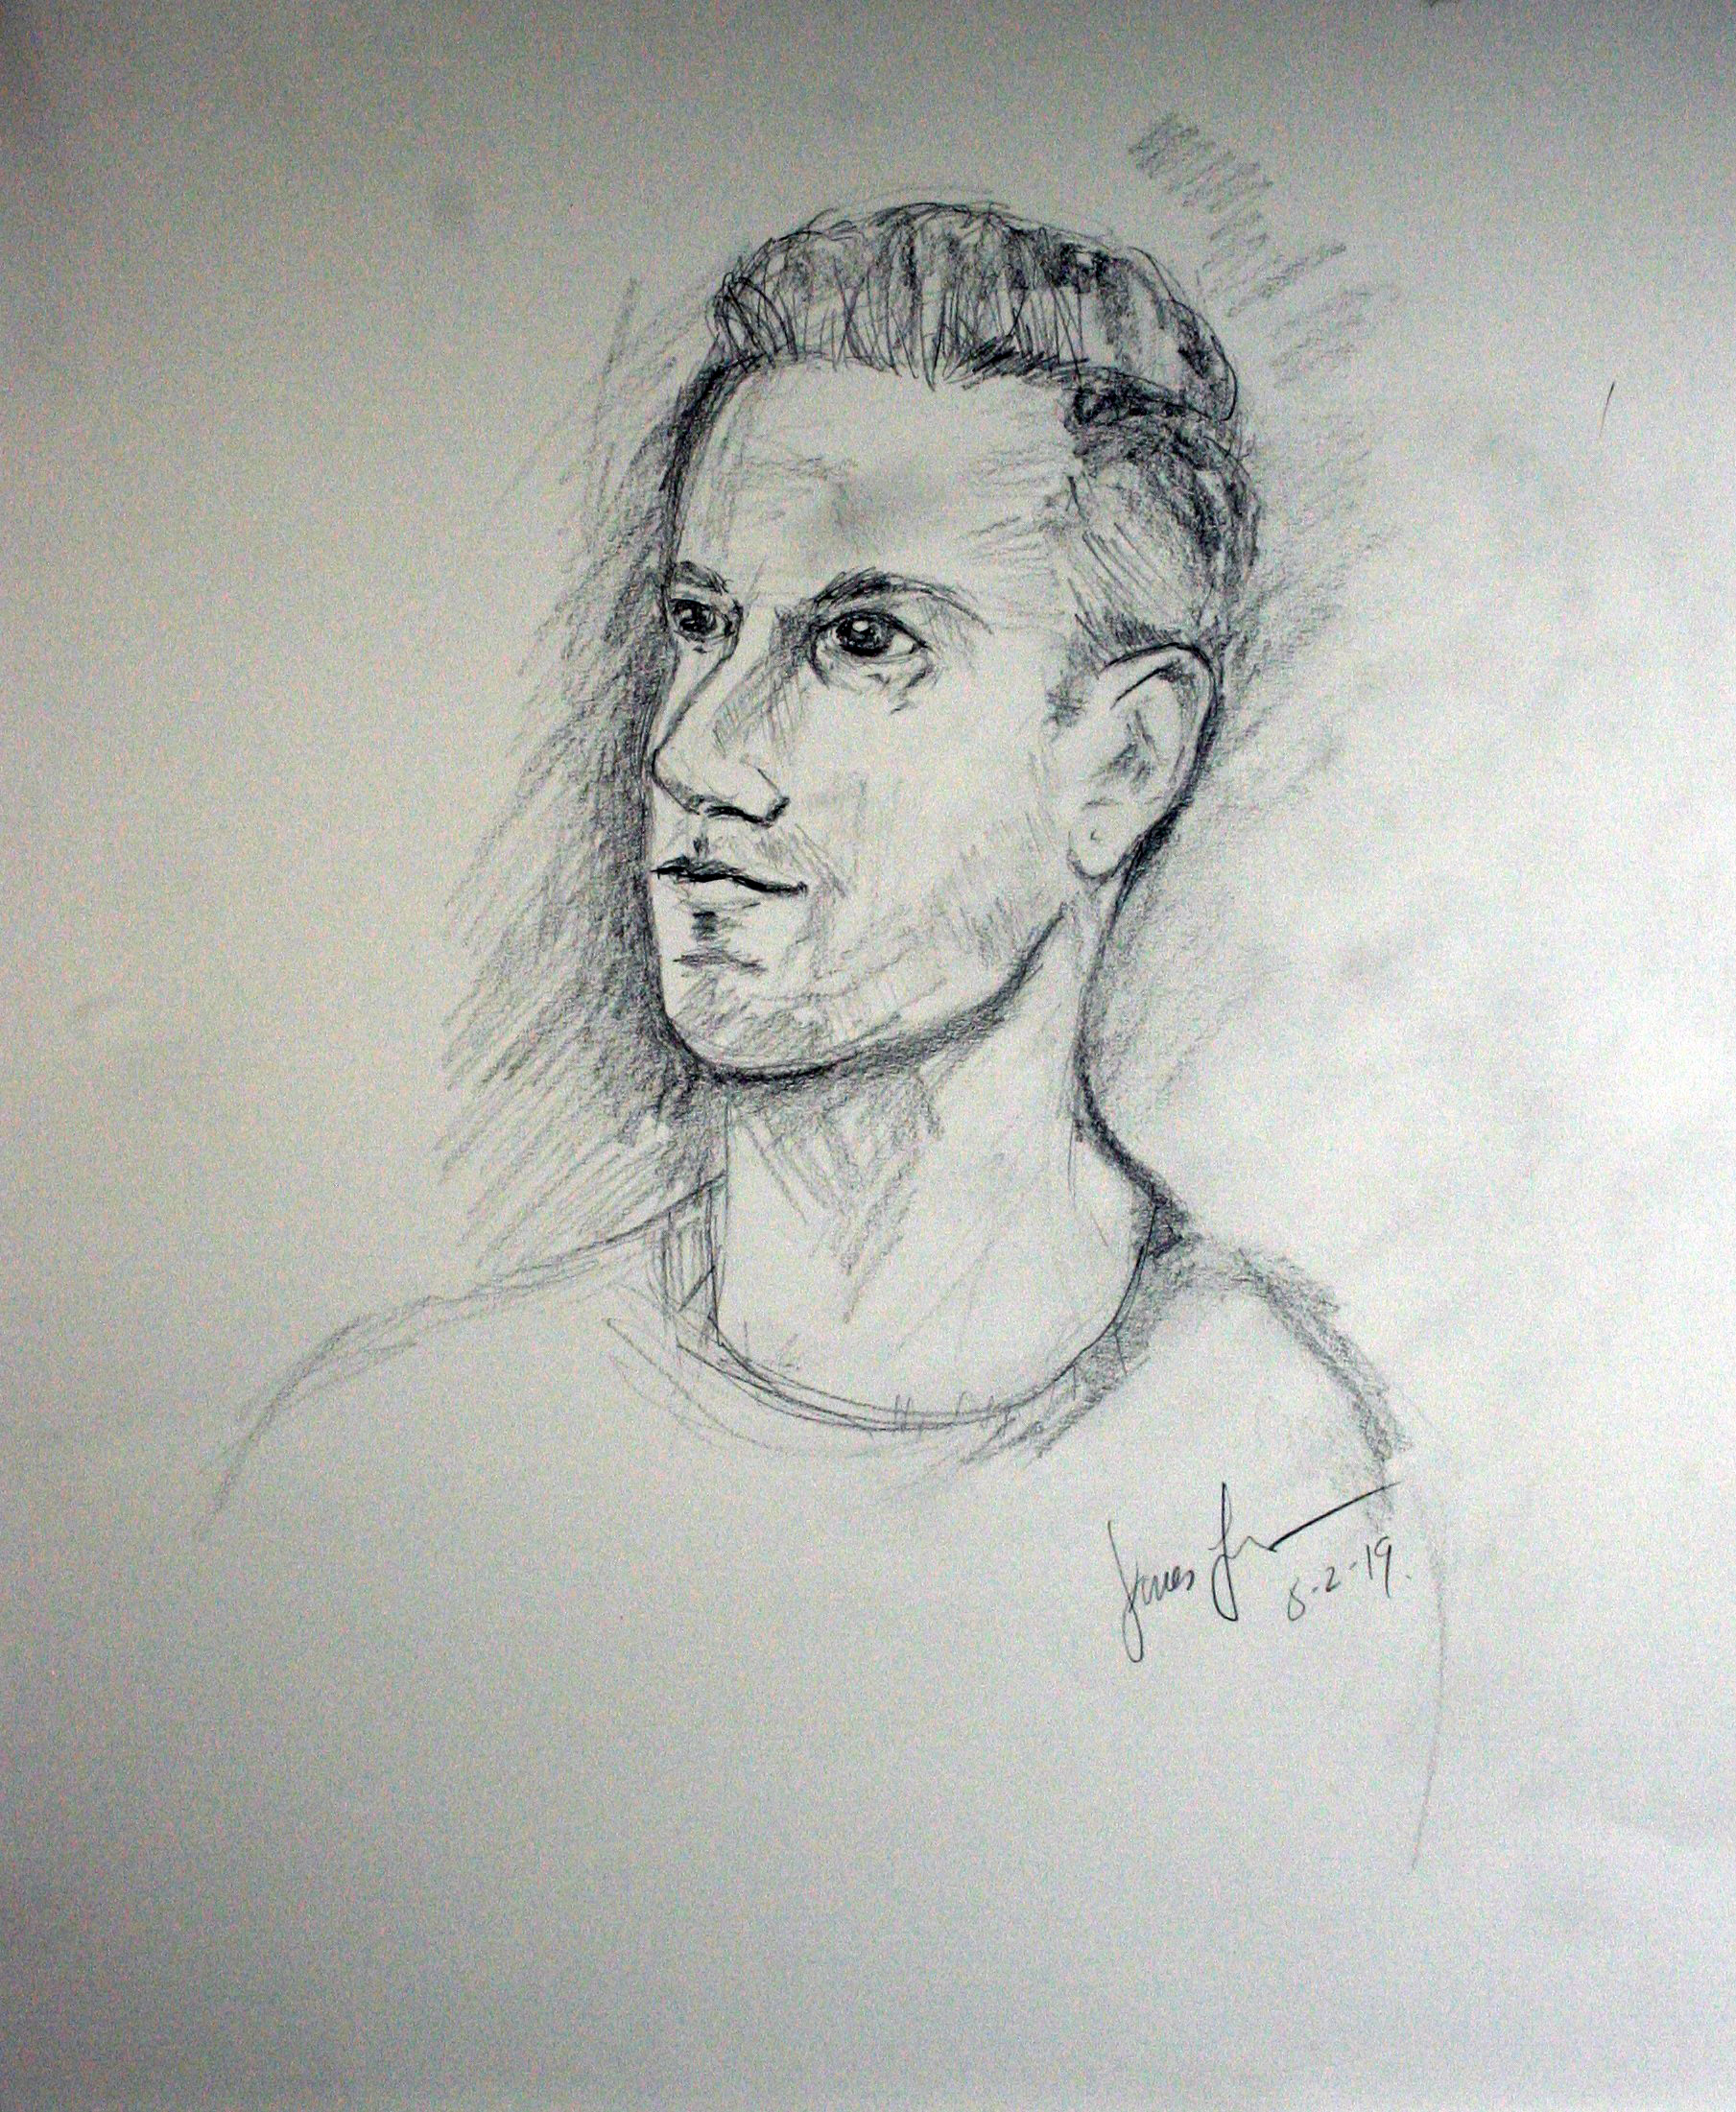 James Lupica - Pencils